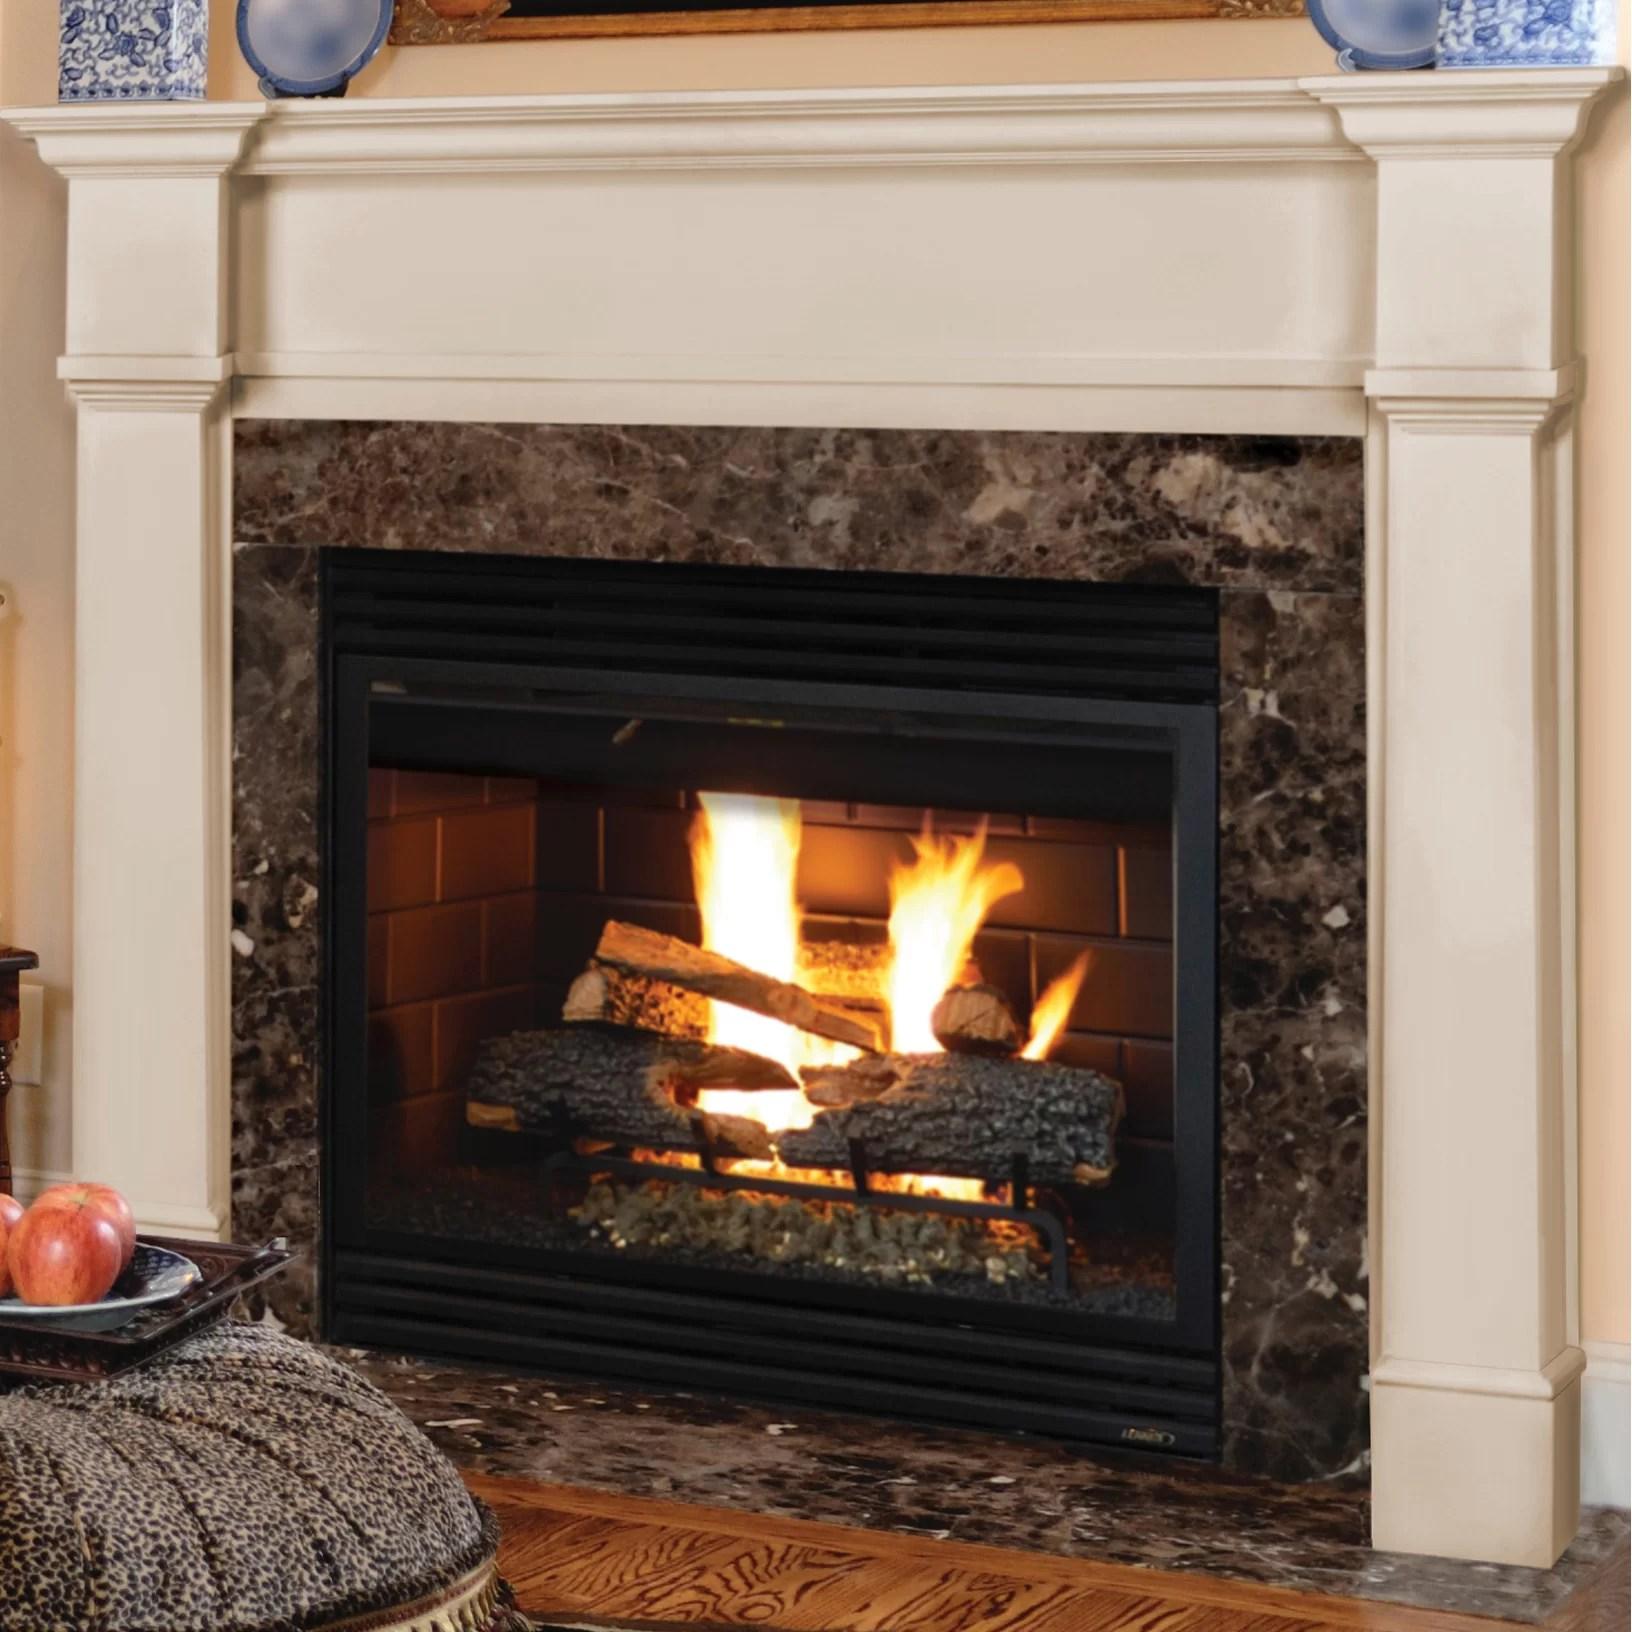 Pearl Mantels Richmond Fireplace Mantel Surround & Reviews